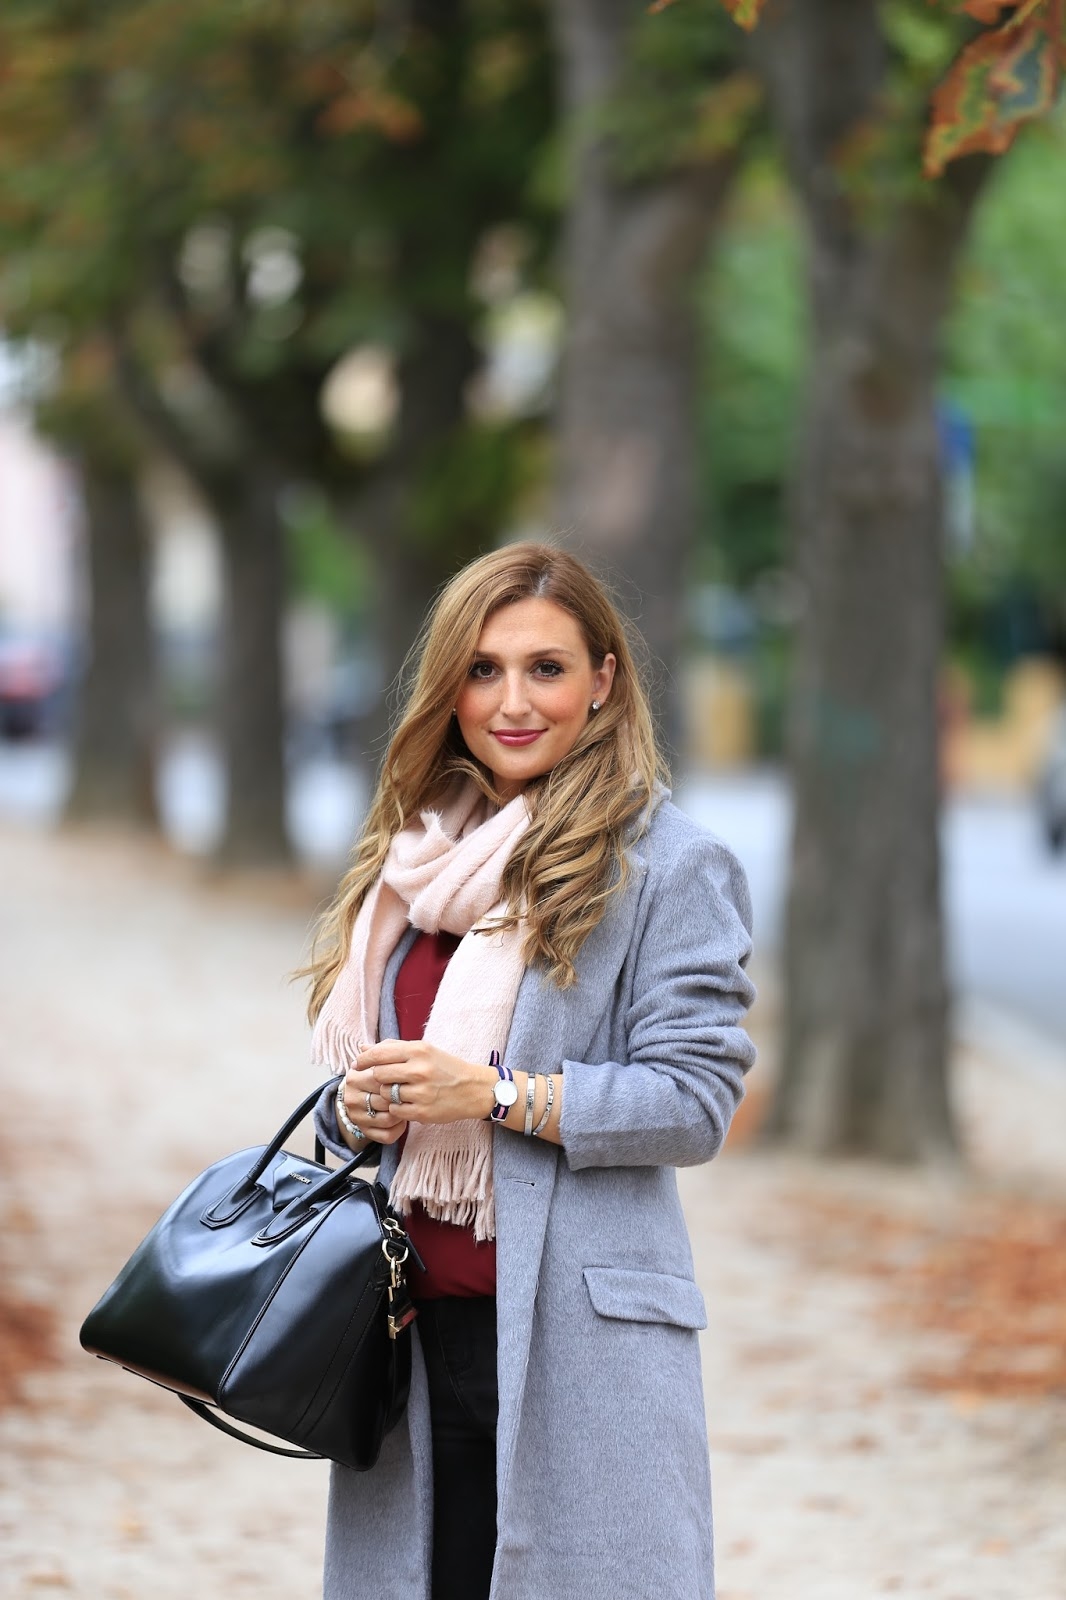 Tamaris Schuhe-fashionstylebyjohanna-fashionblog-münchen-blogger-fashionblogger-bloggerdeutschland-lifestyleblog-frankfurt-germanblogger-outfit-schwarze Jeans